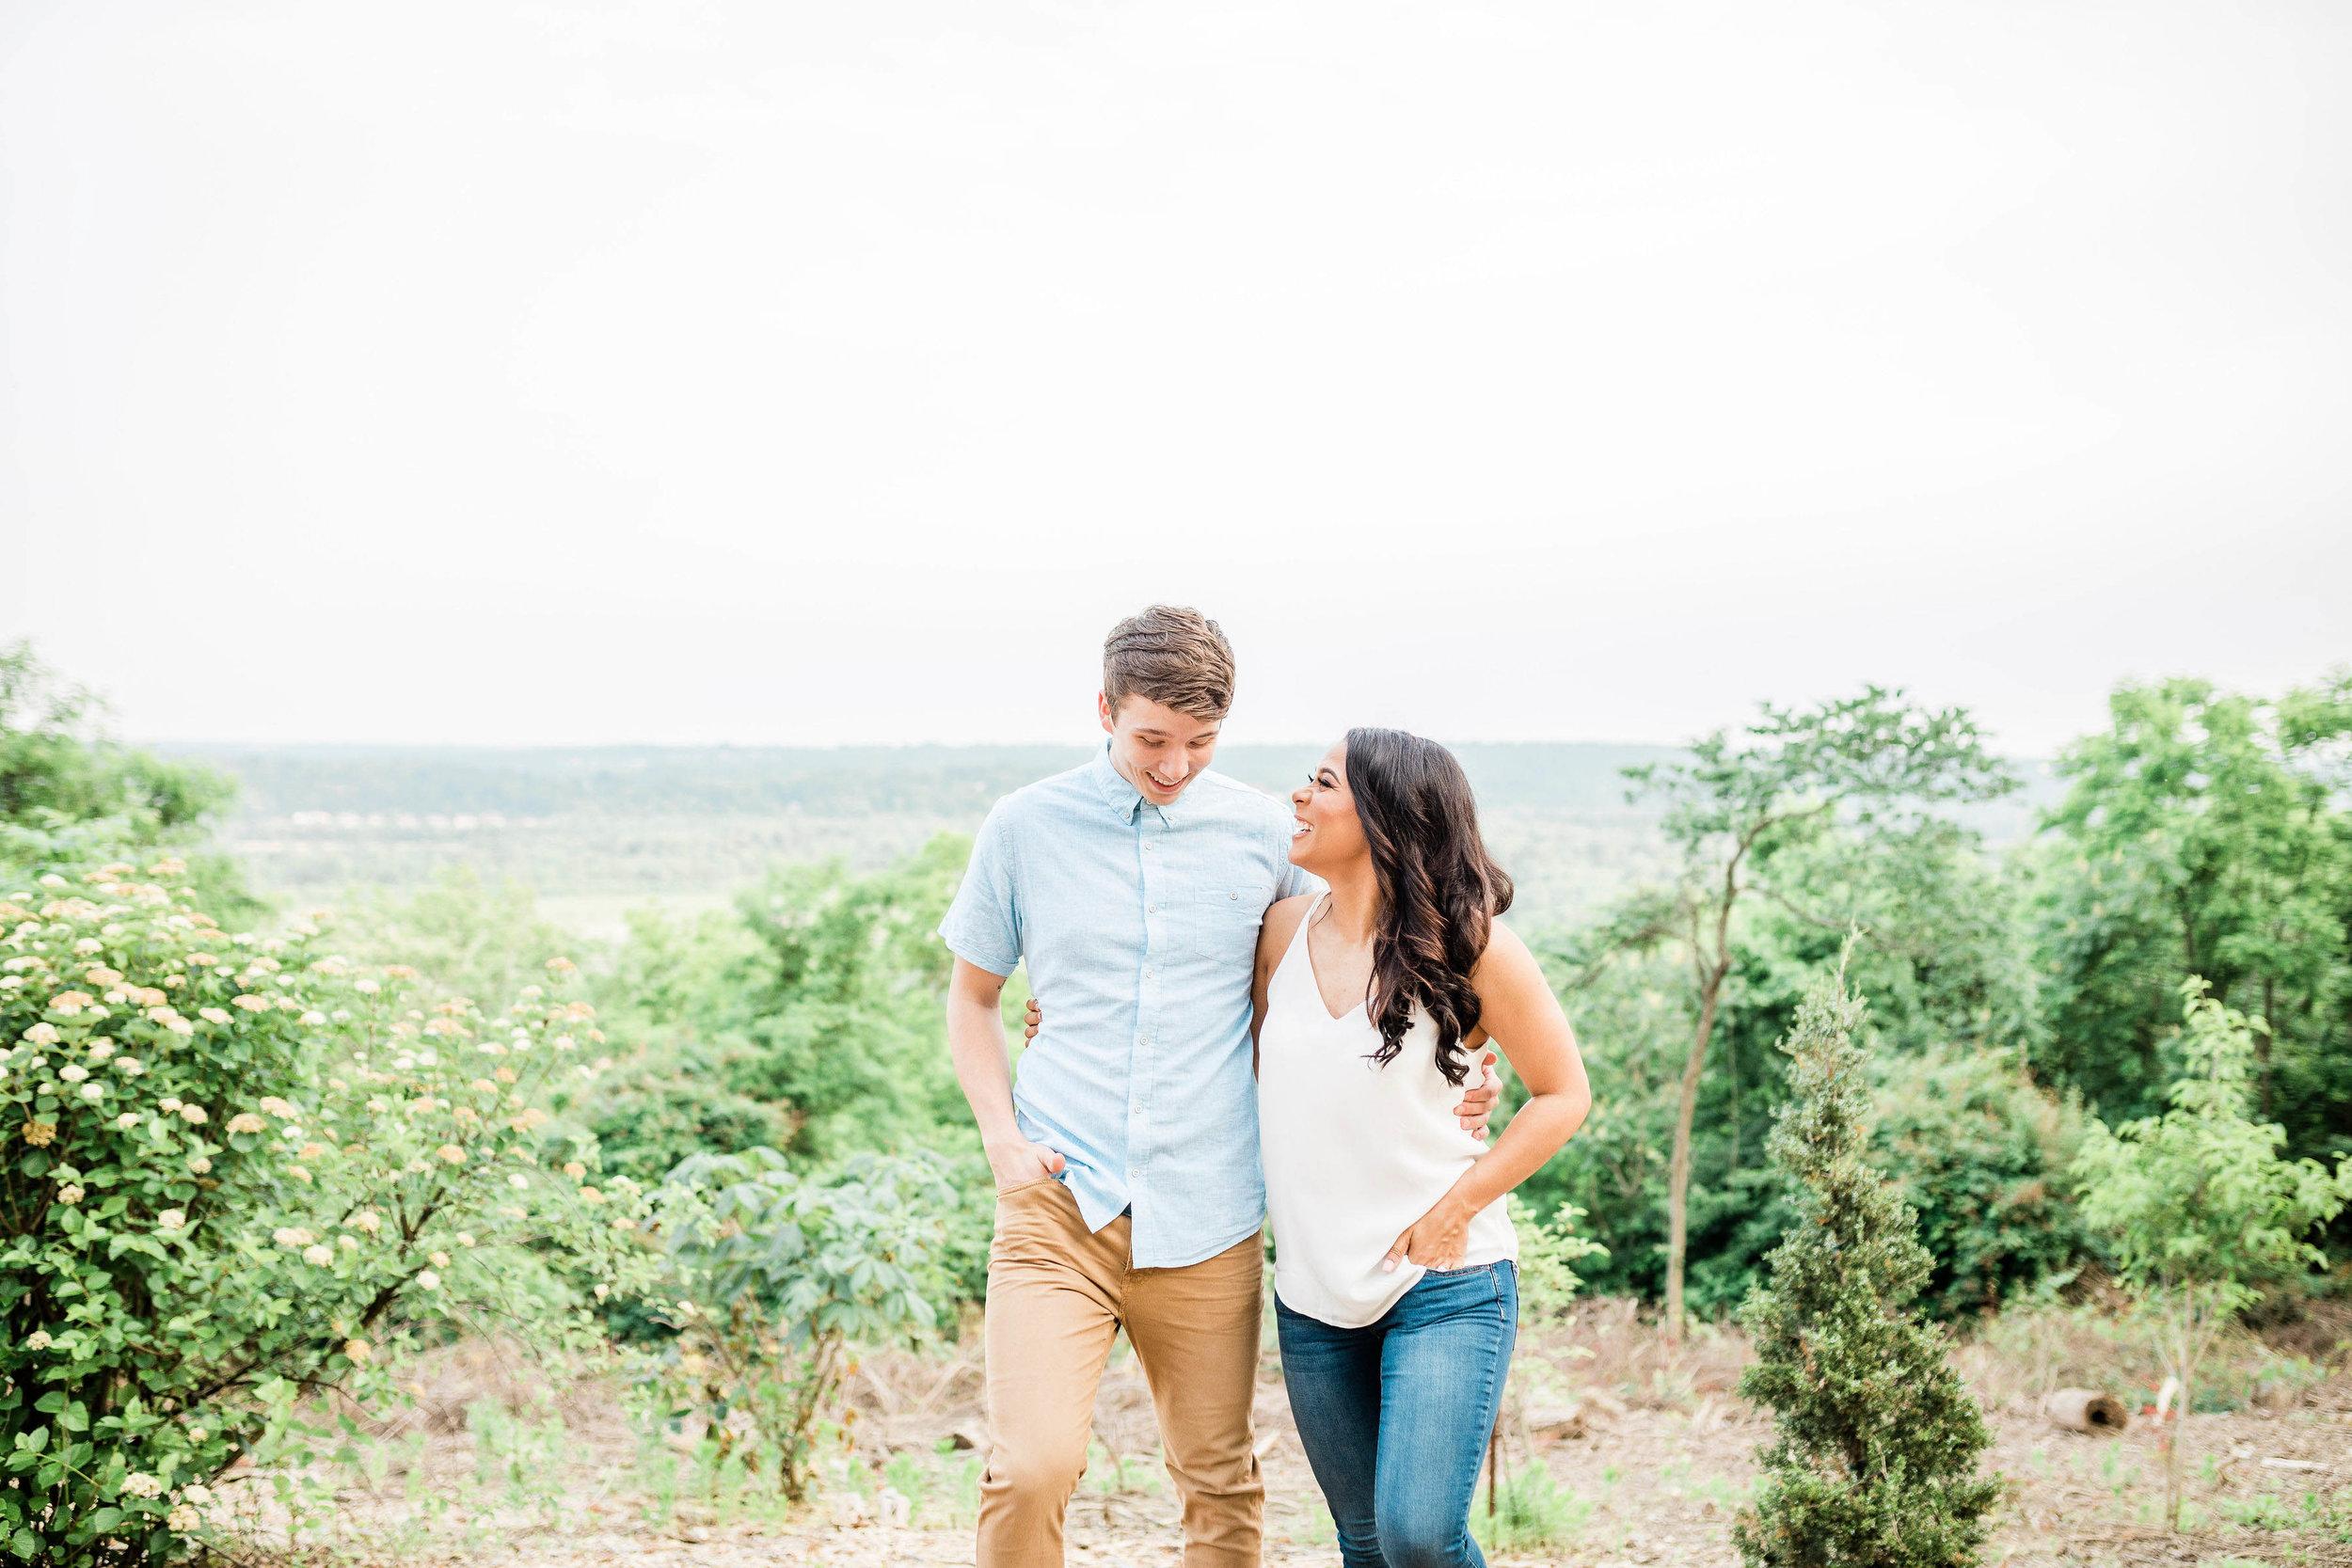 cincinnati dayton ohio engagement wedding photographers-1.jpg